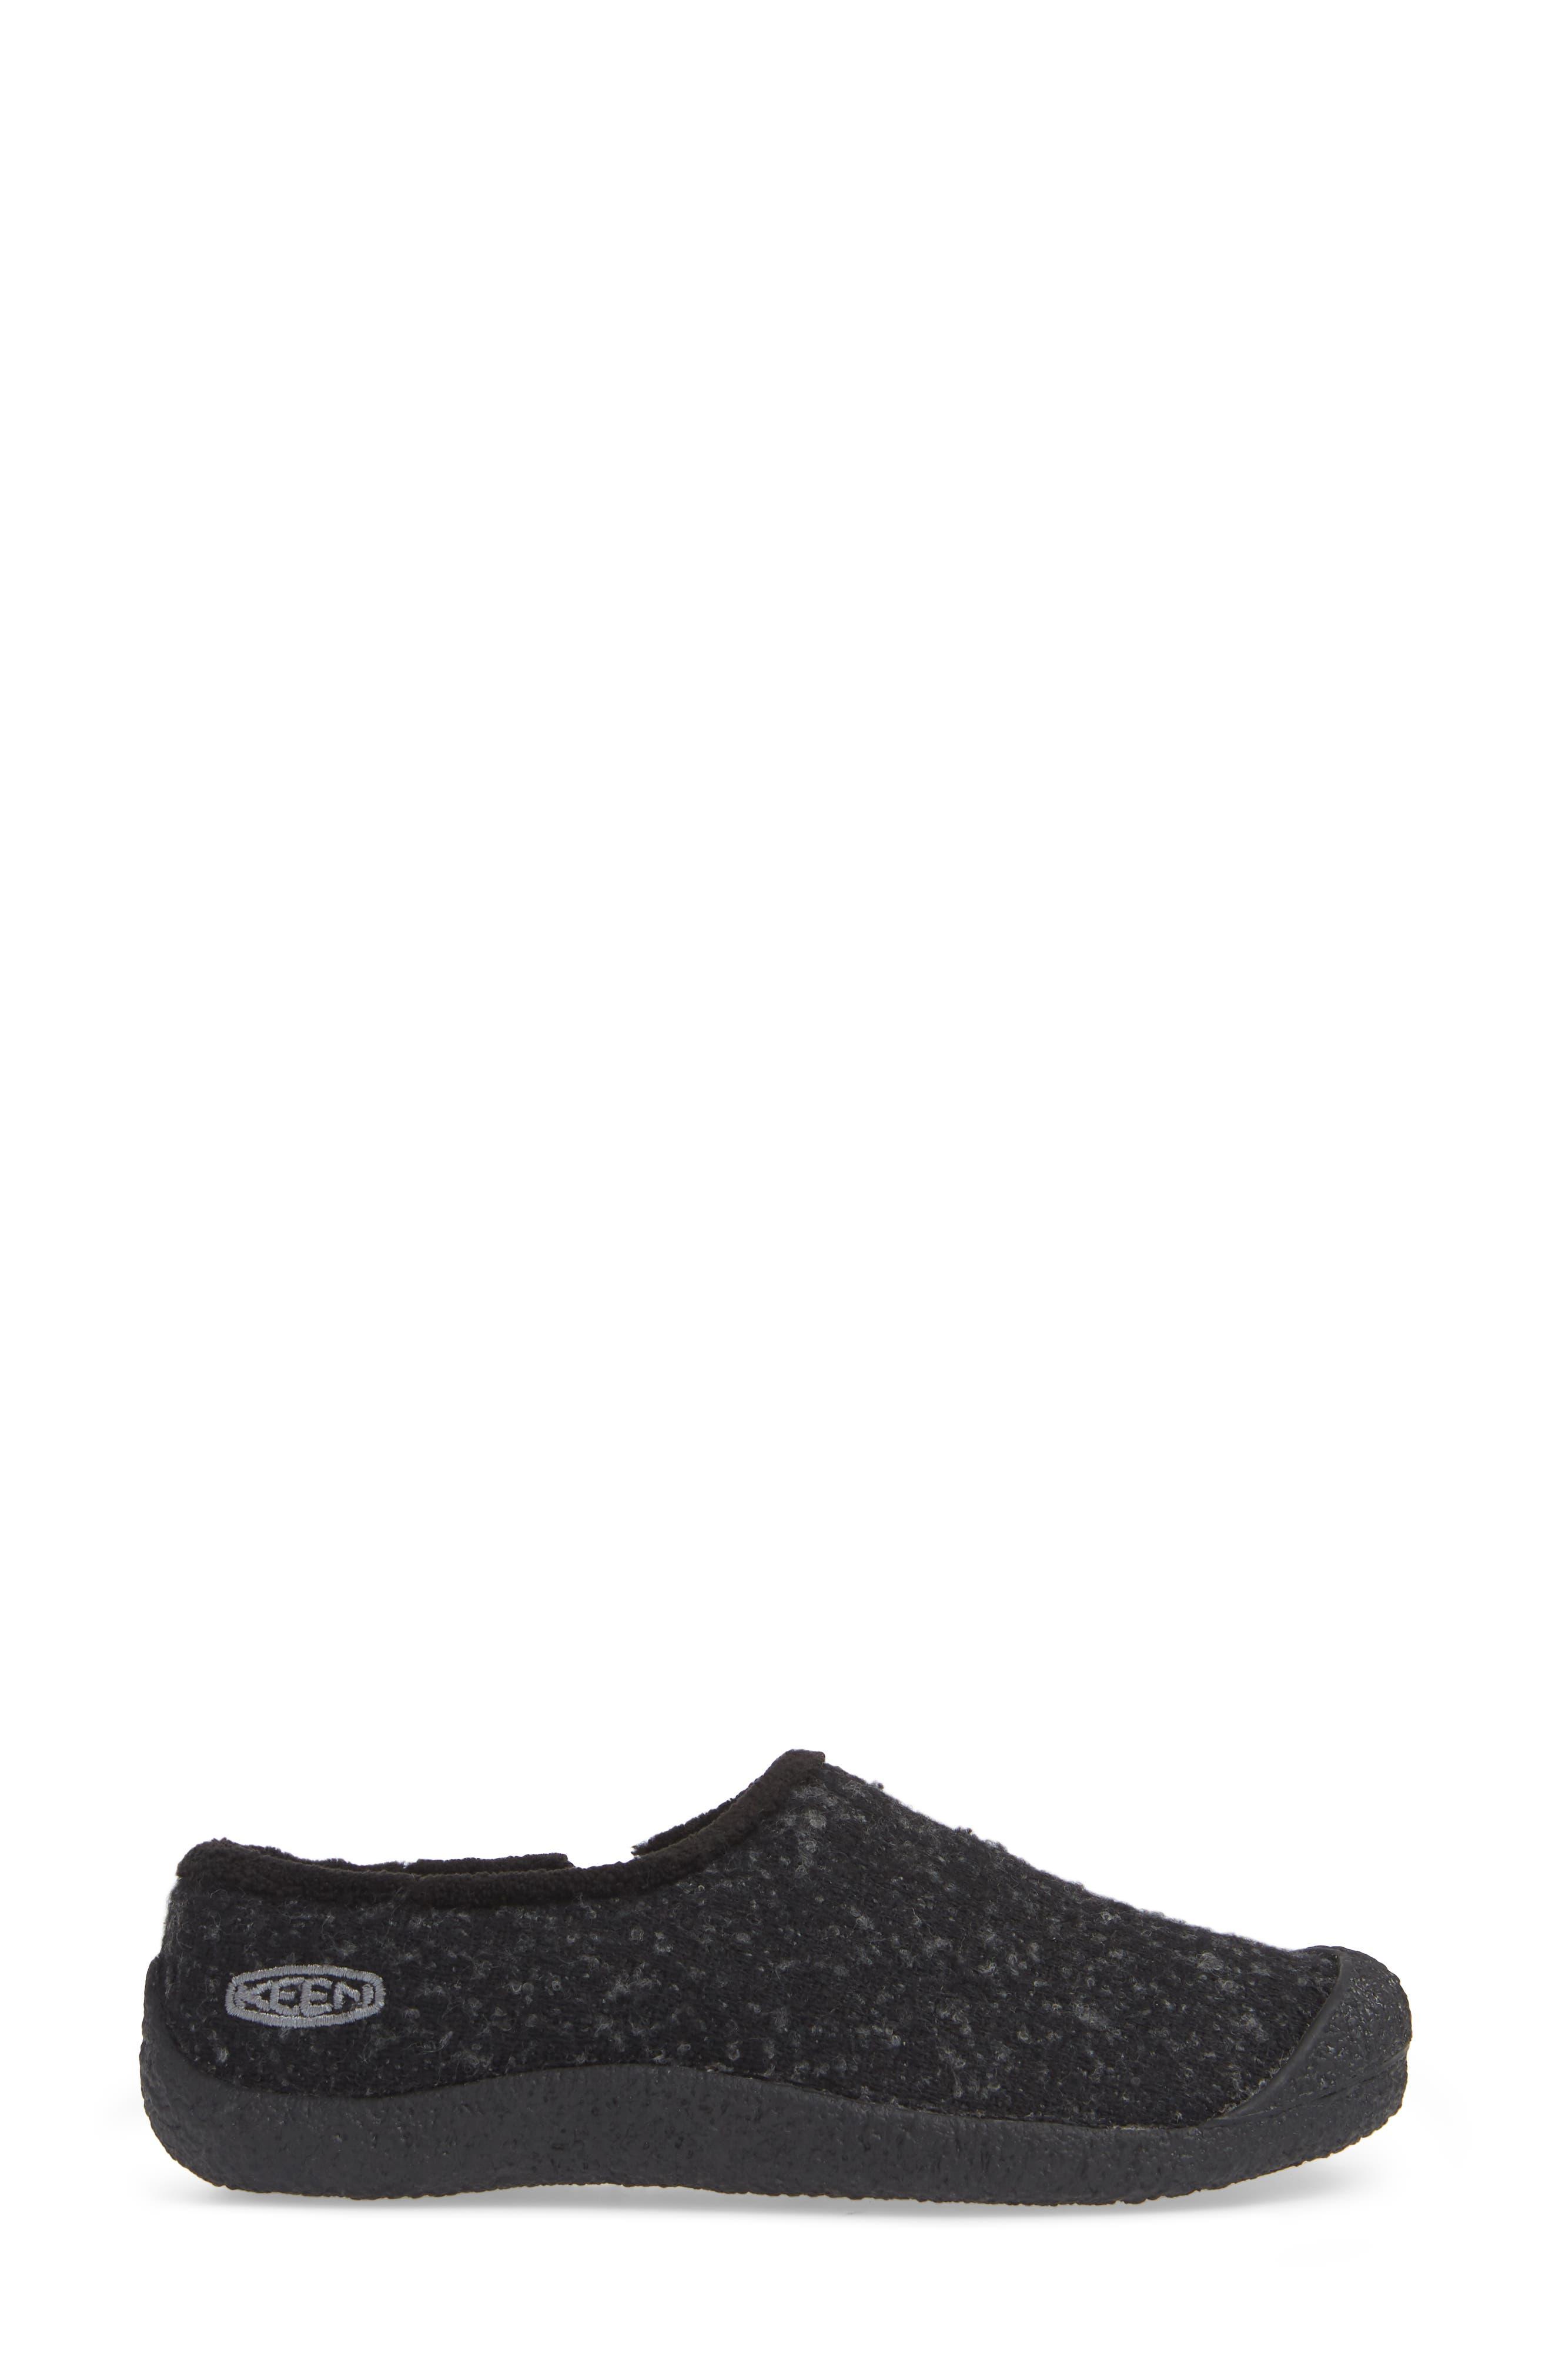 Howser Round Toe Wool Slip-on,                             Alternate thumbnail 3, color,                             BLACK KNOBBY/ STEEL GREY WOOL